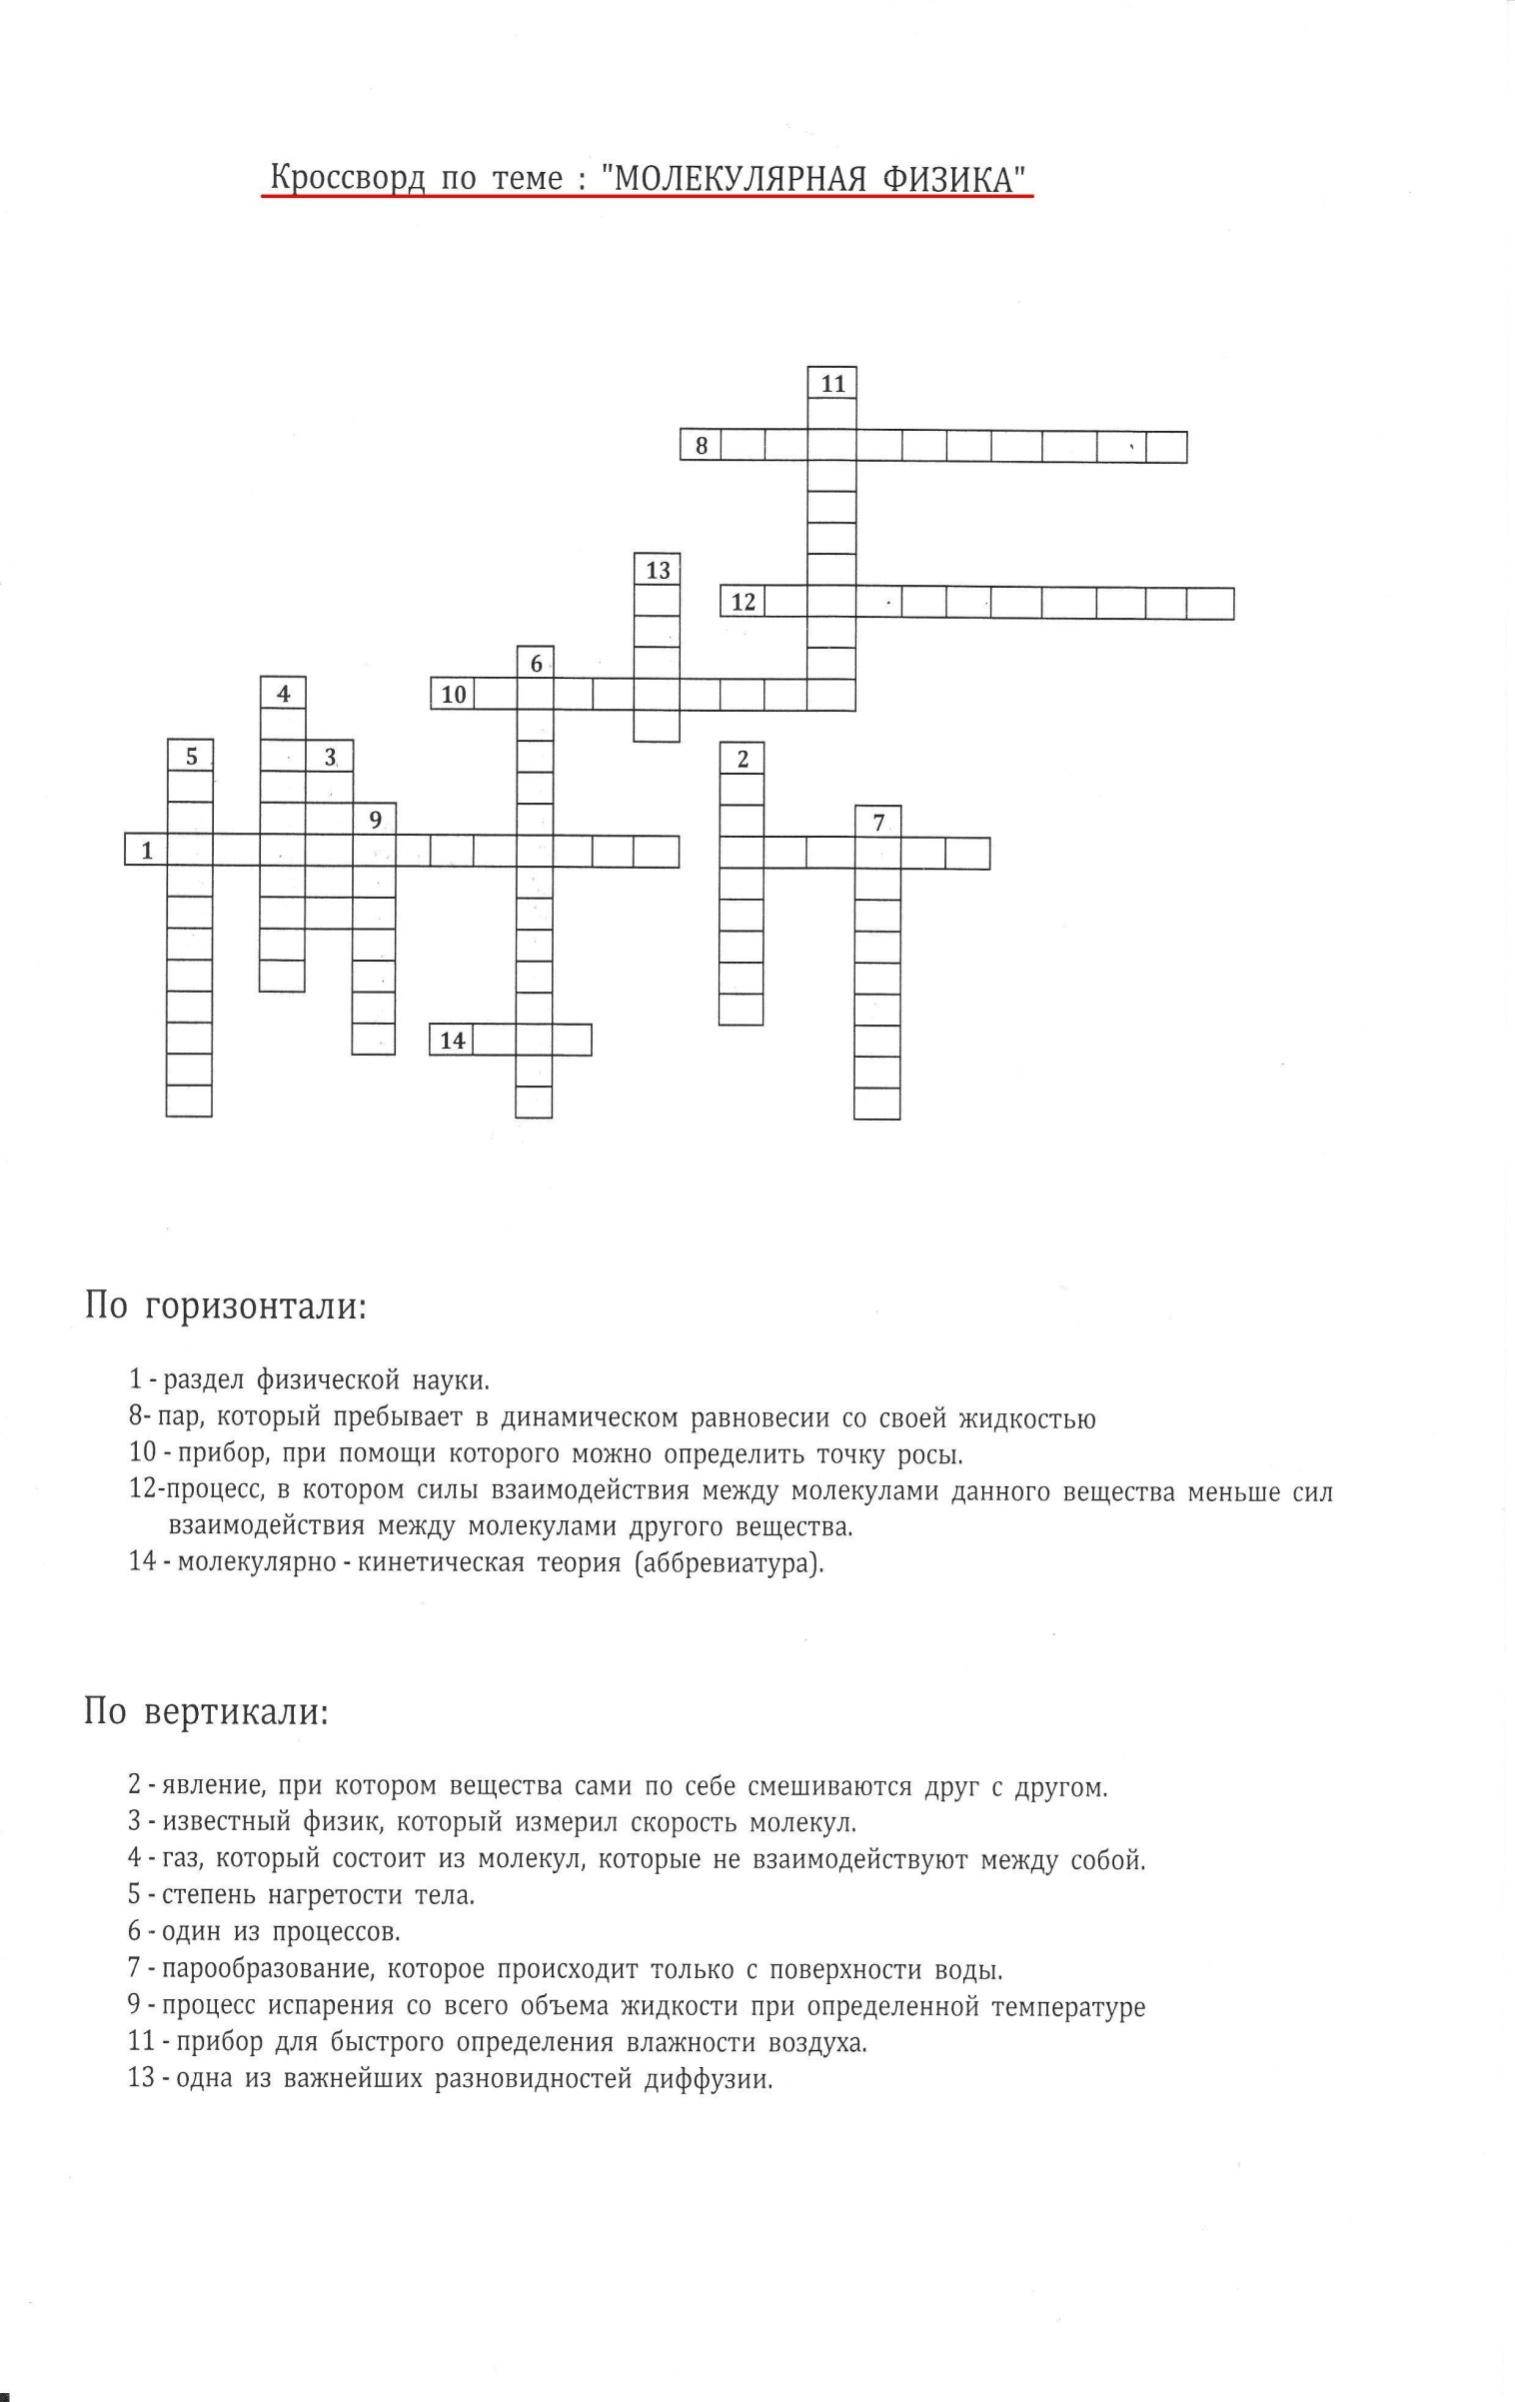 C:\Documents and Settings\UserXP\Мои документы\Мои рисунки\MP Navigator EX\кроссворды\IMG_0001.jpg